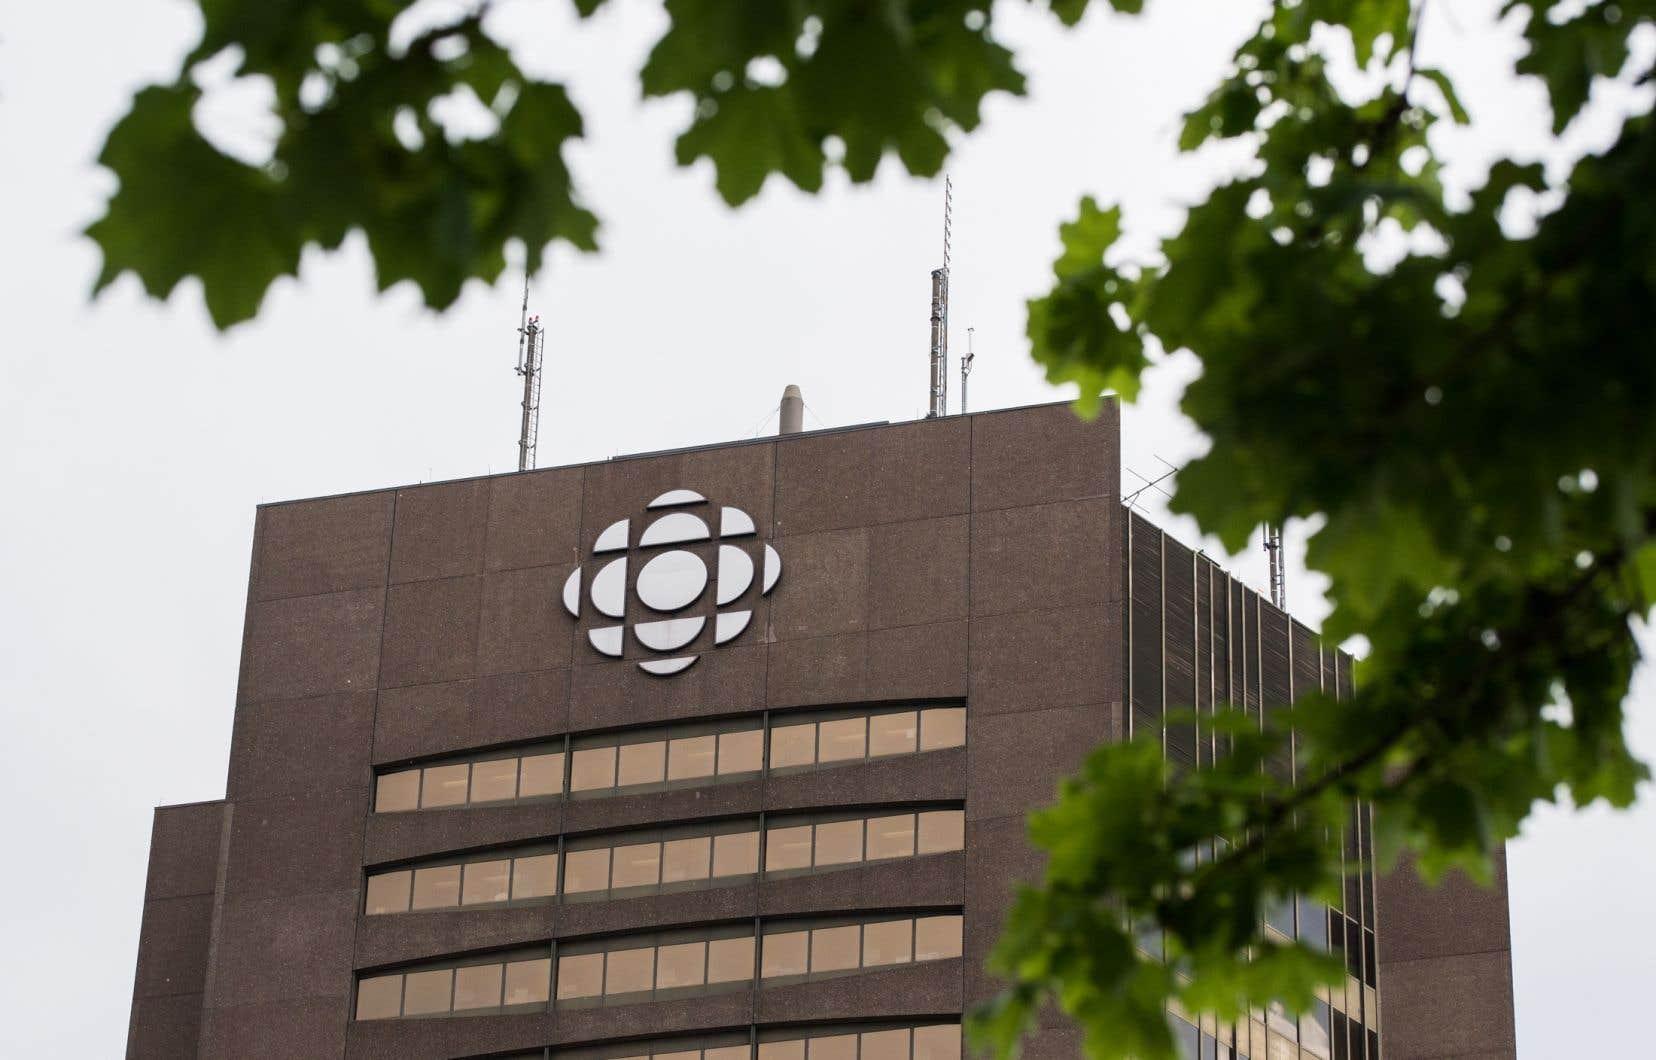 Radio canada ferme son bureau de beyrouth le devoir